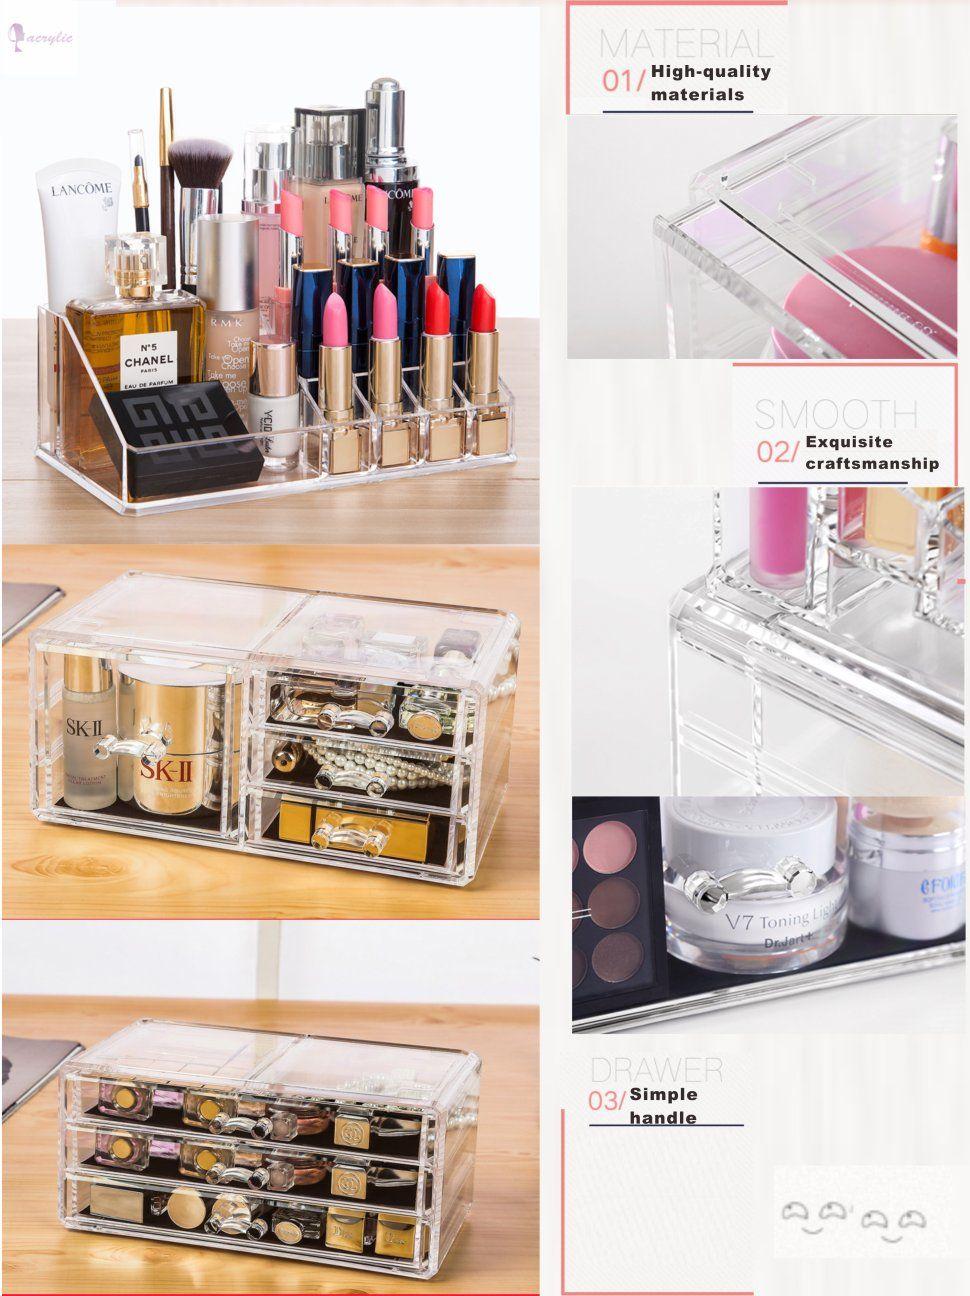 Cq acrylic 7 Drawers and 16 Grid Makeup